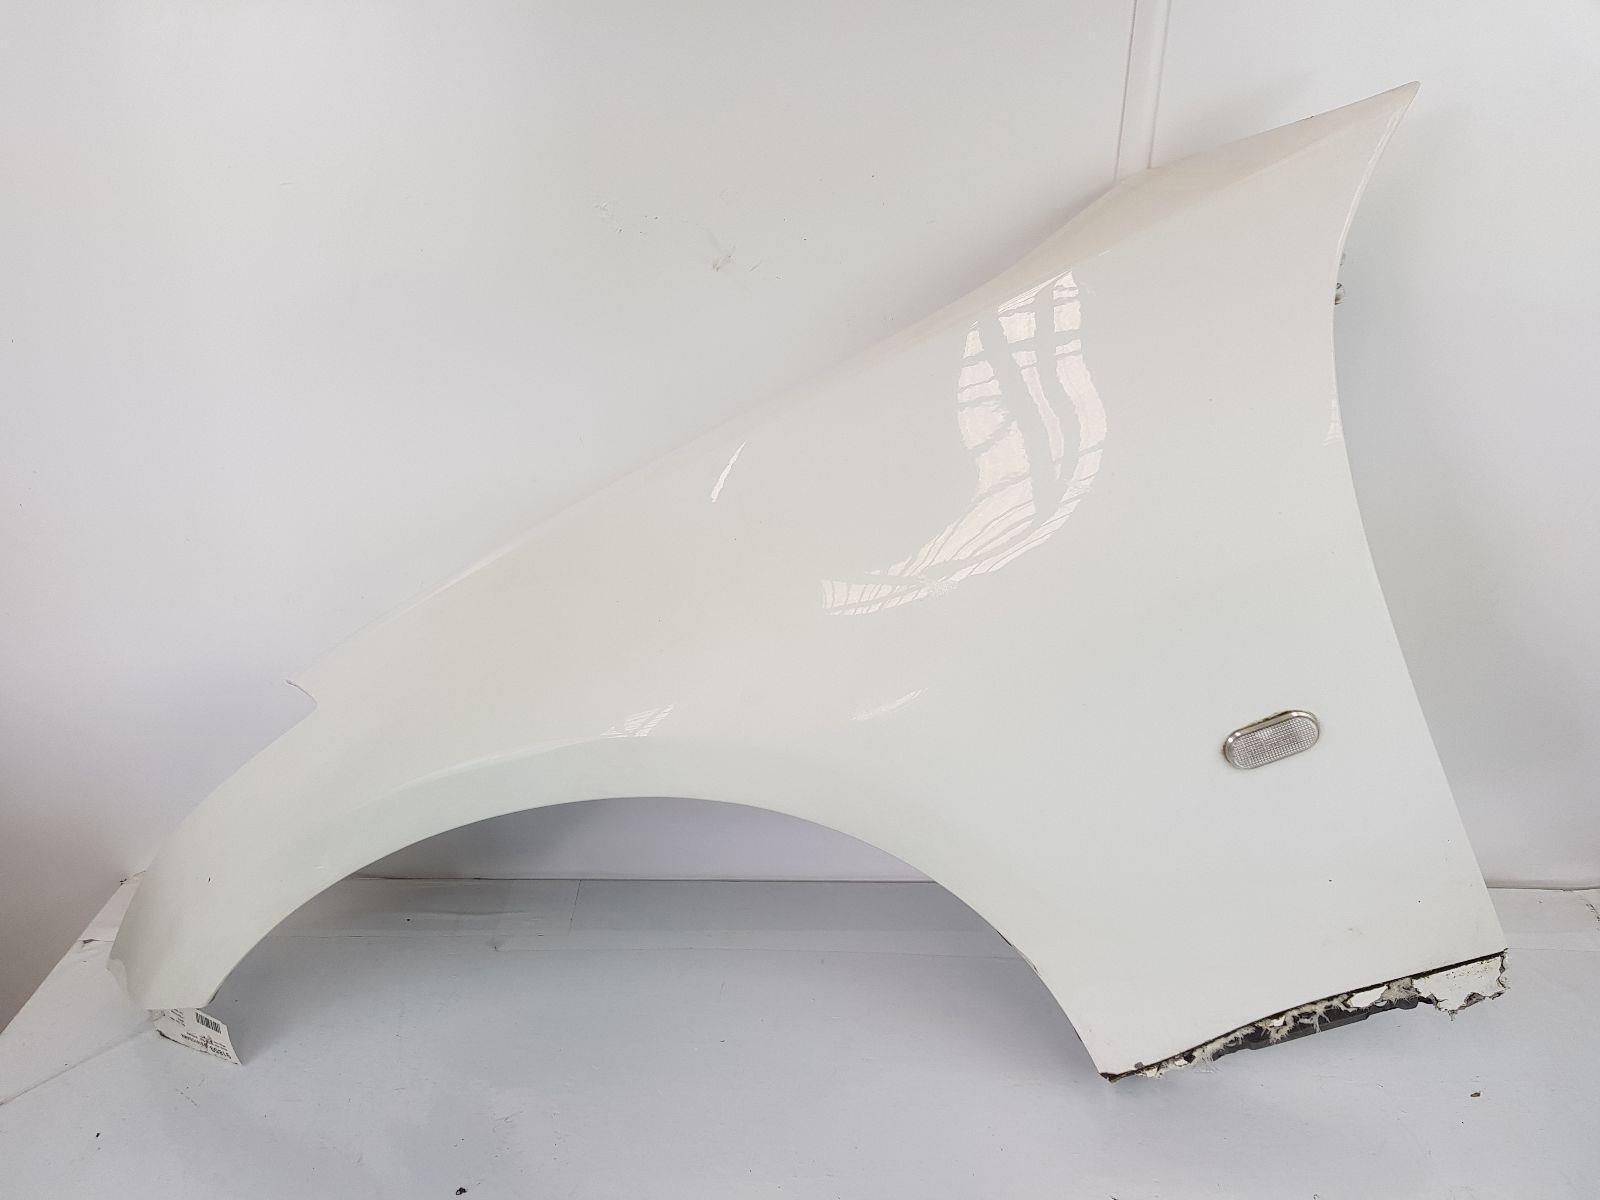 2005 MK1 Nissan 350Z FRONT WING LH Passenger Side White F3101CD4MA